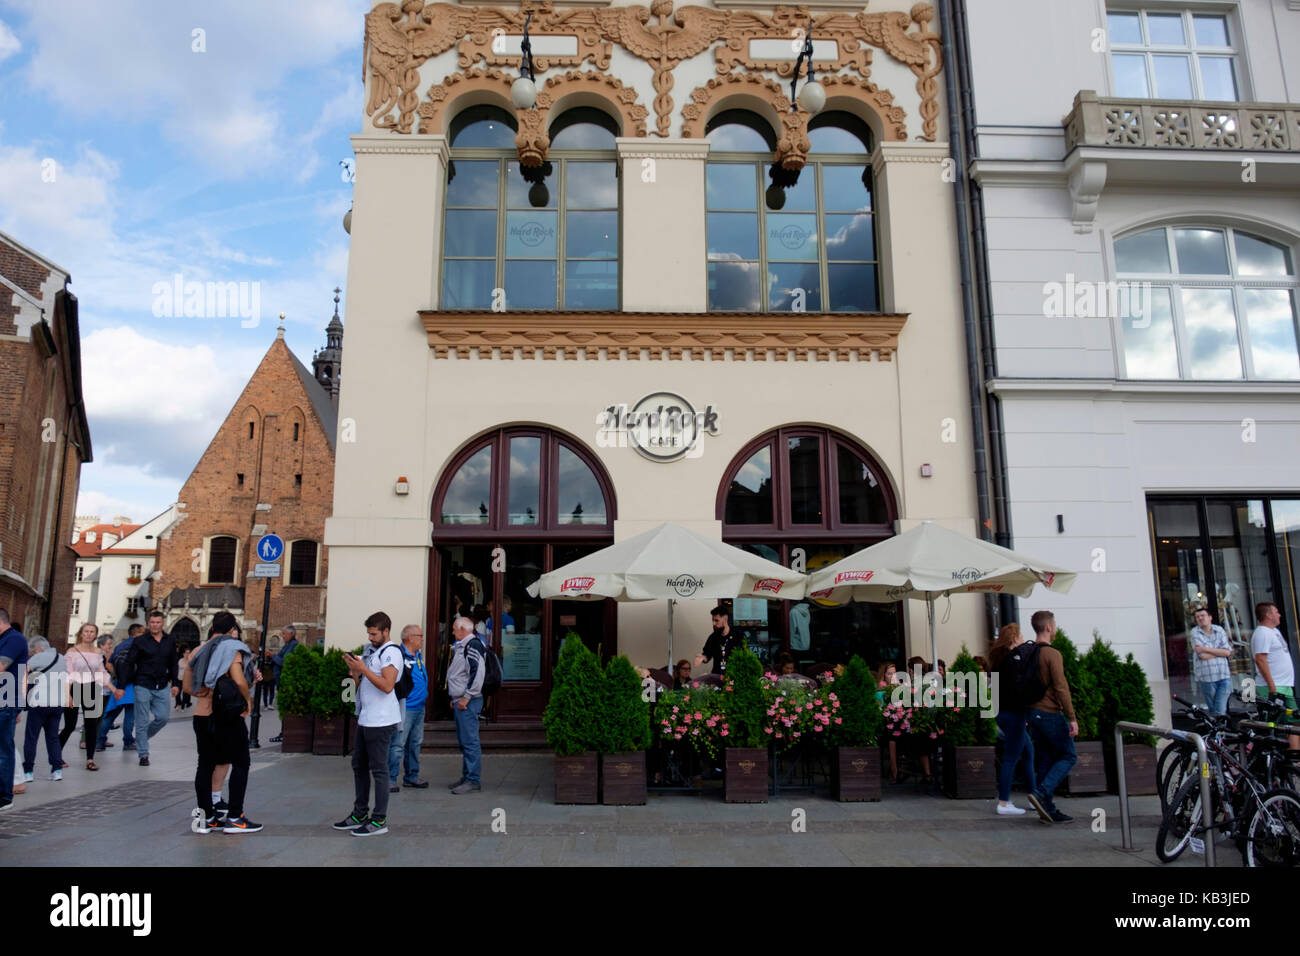 Hard Rock Cafe in Krakow, Poland, Europe - Stock Image